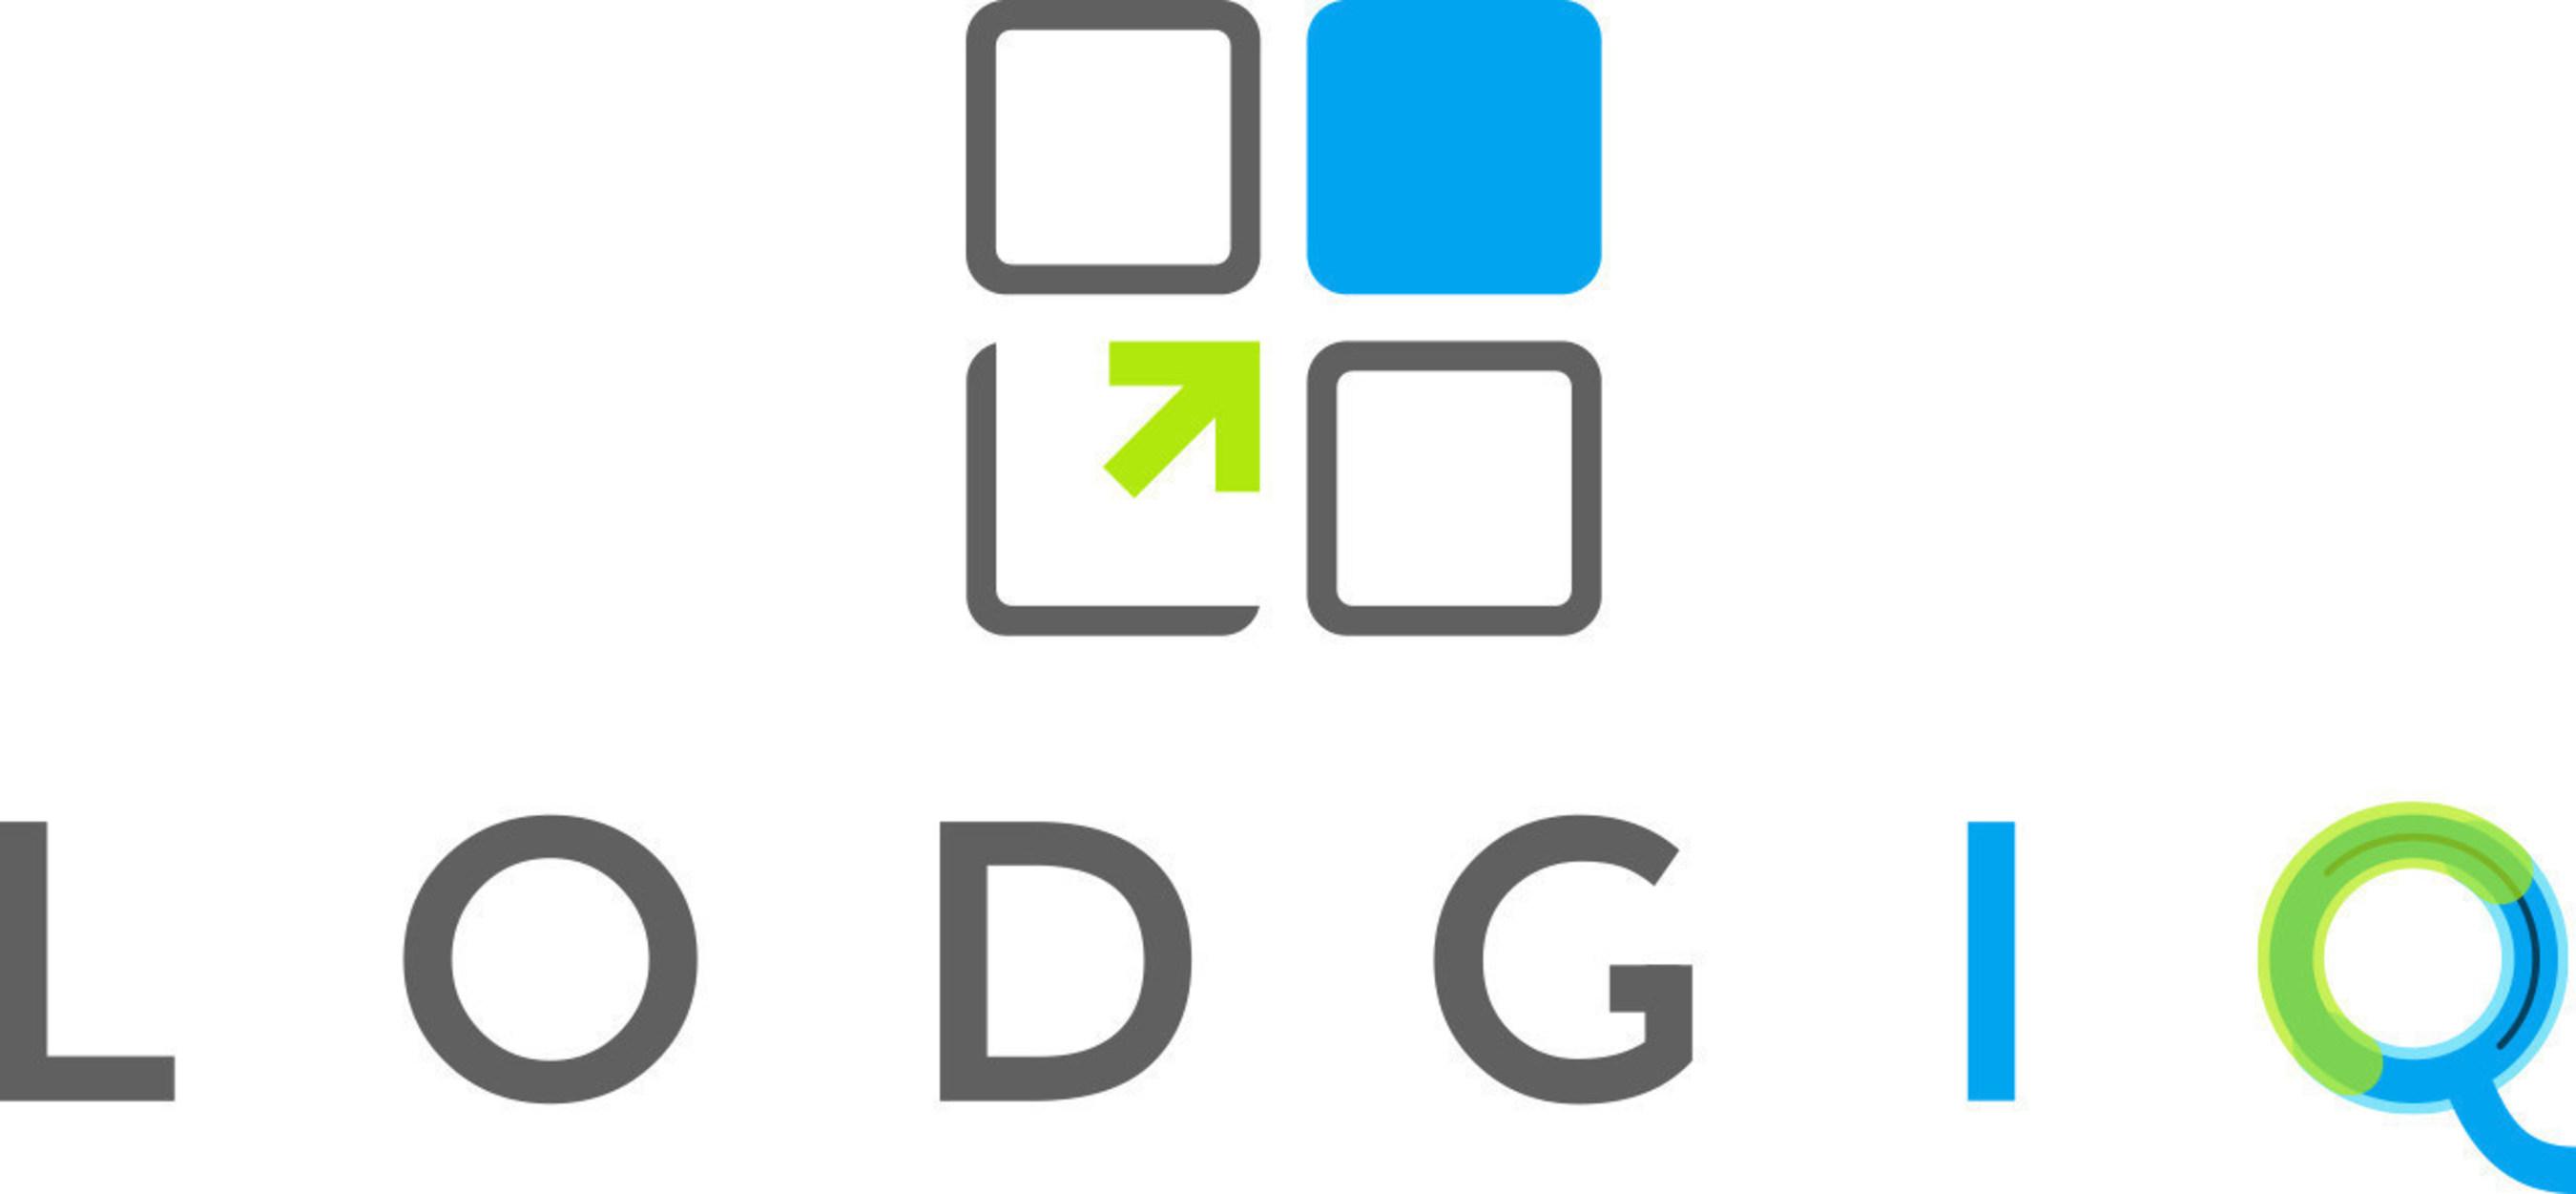 Next-Generation Revenue Optimization Platform, LodgIQ RM™ Selected by Highgate for Portfolio-Wide